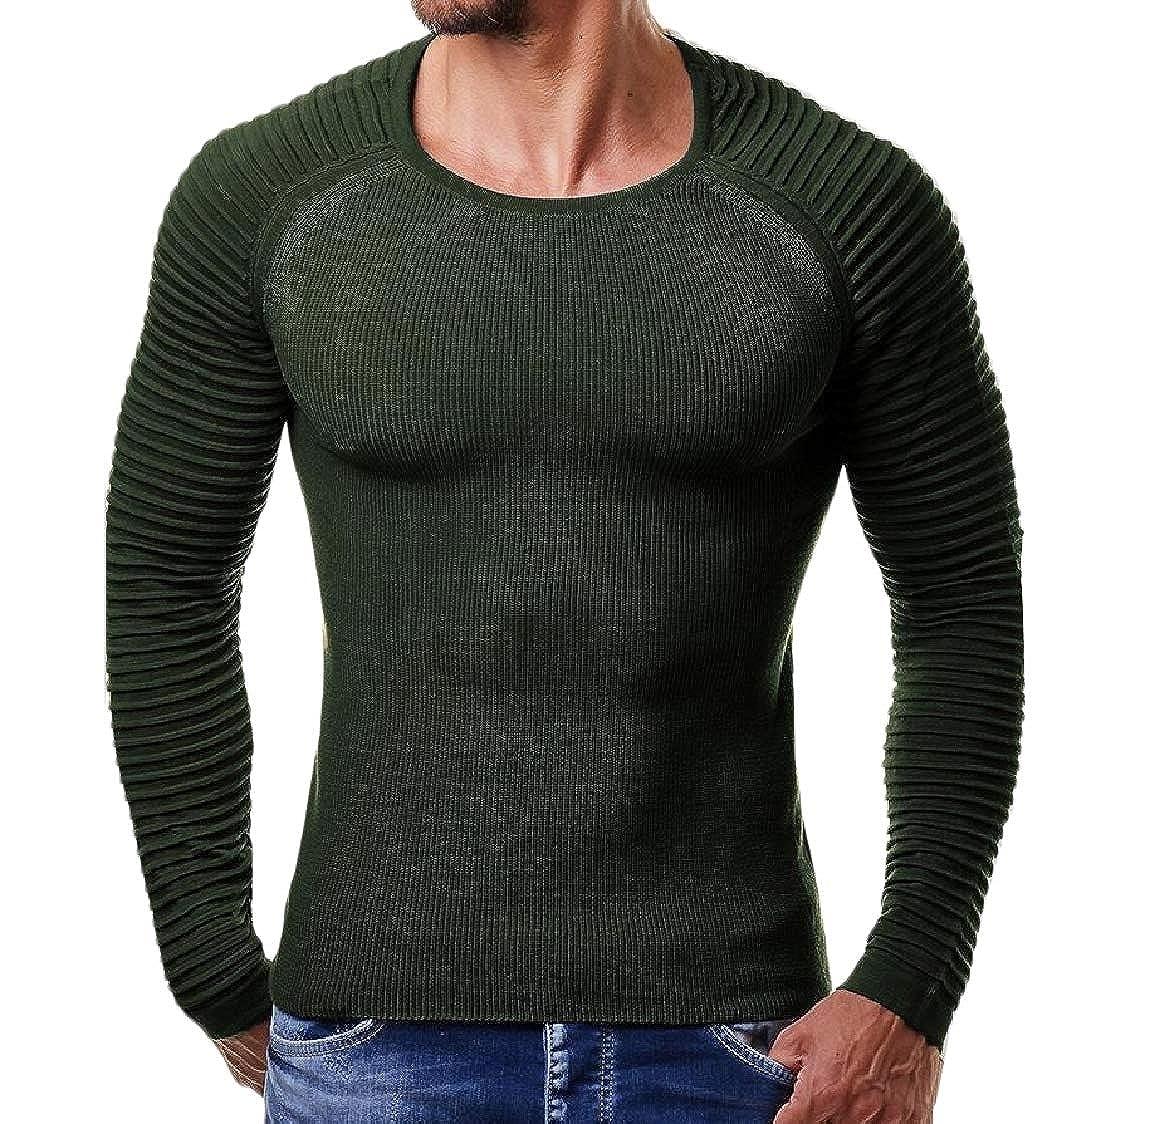 Vska Mens Autumn Regular Ribbed Stretch Knitted Warm Sweater Pullover